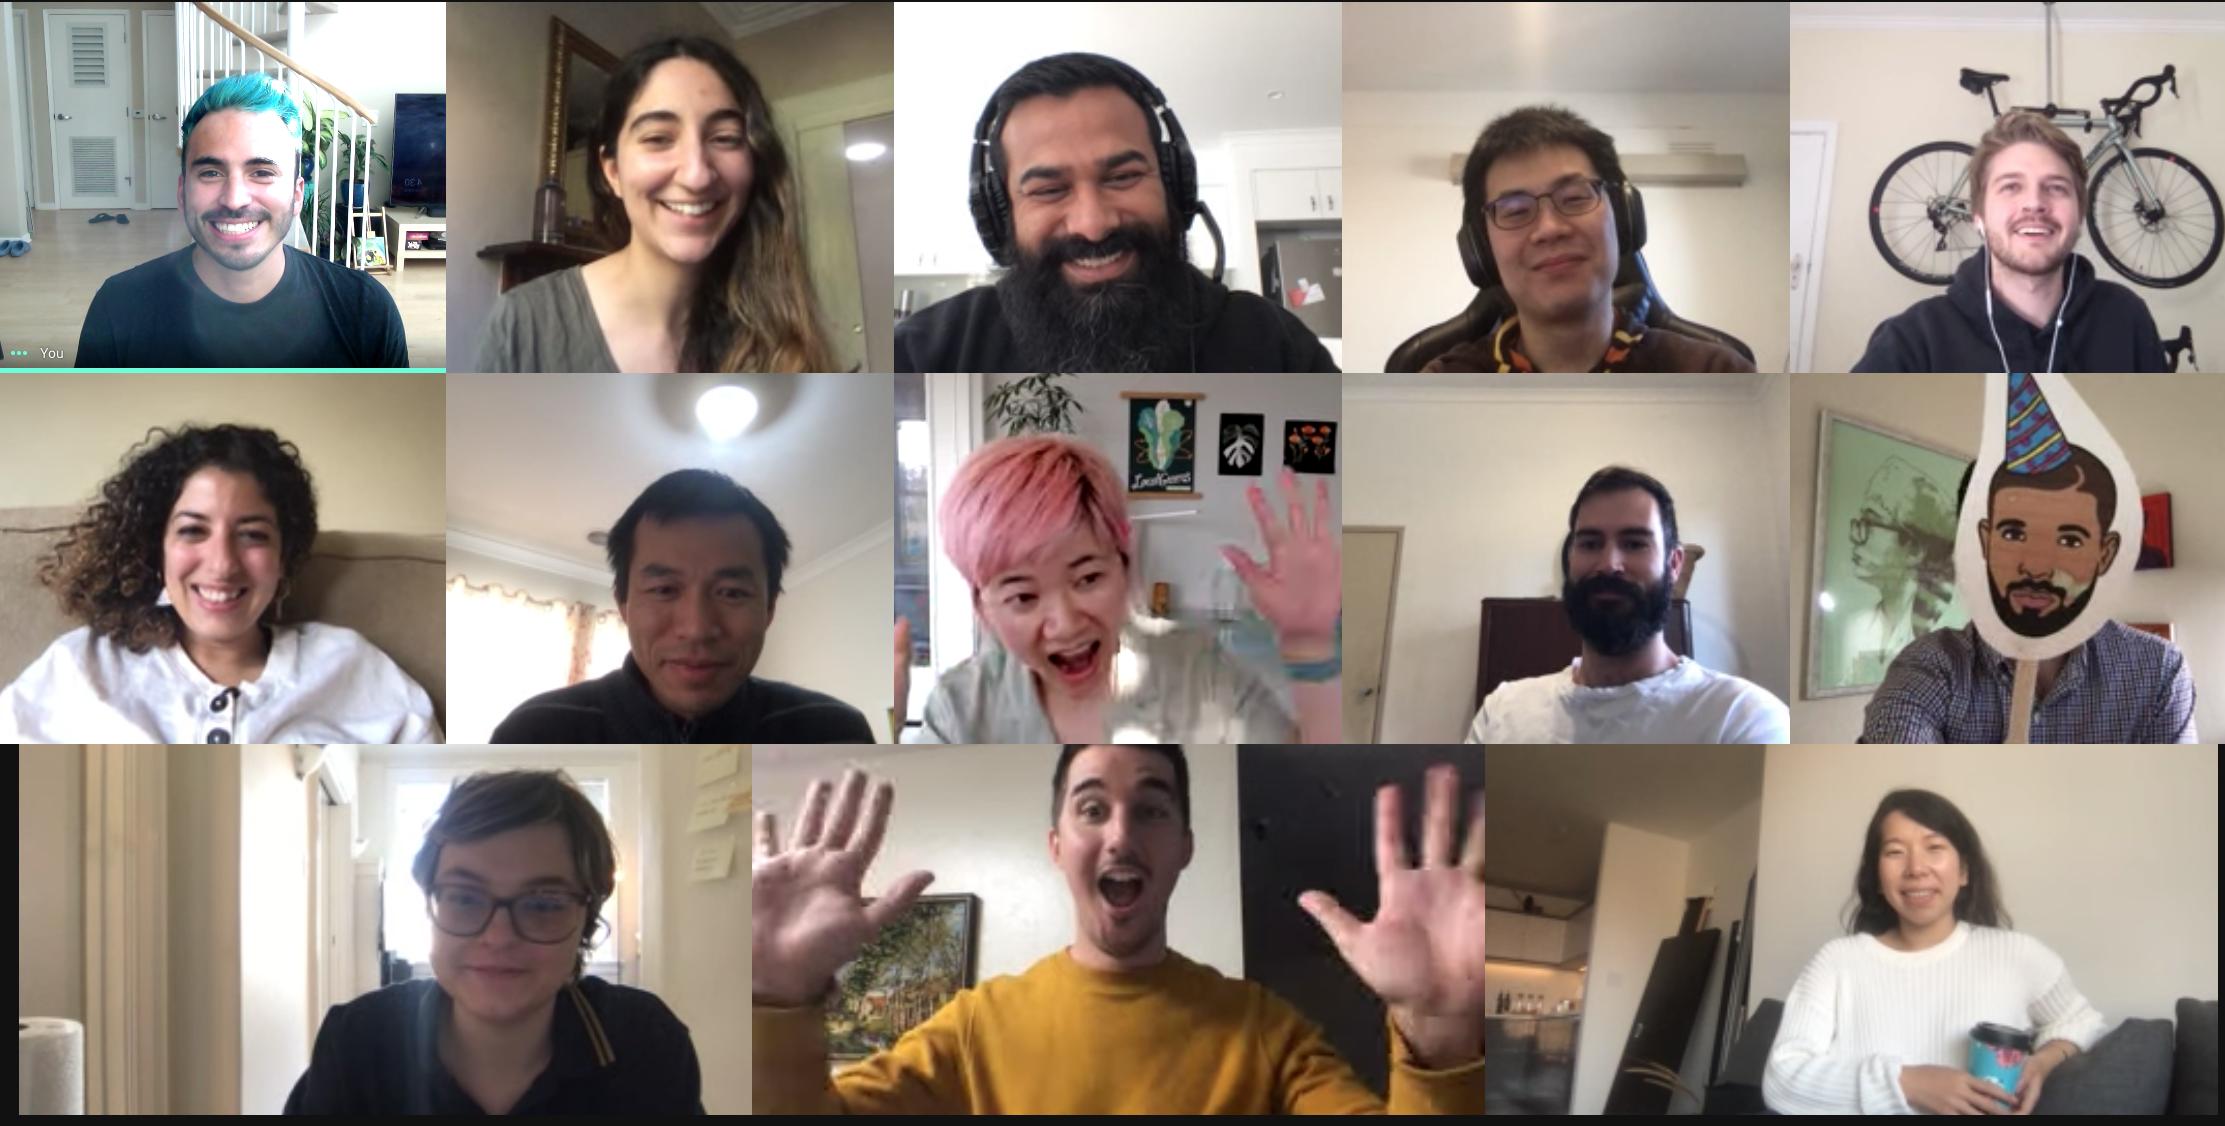 Celebrating birthdays via video conference